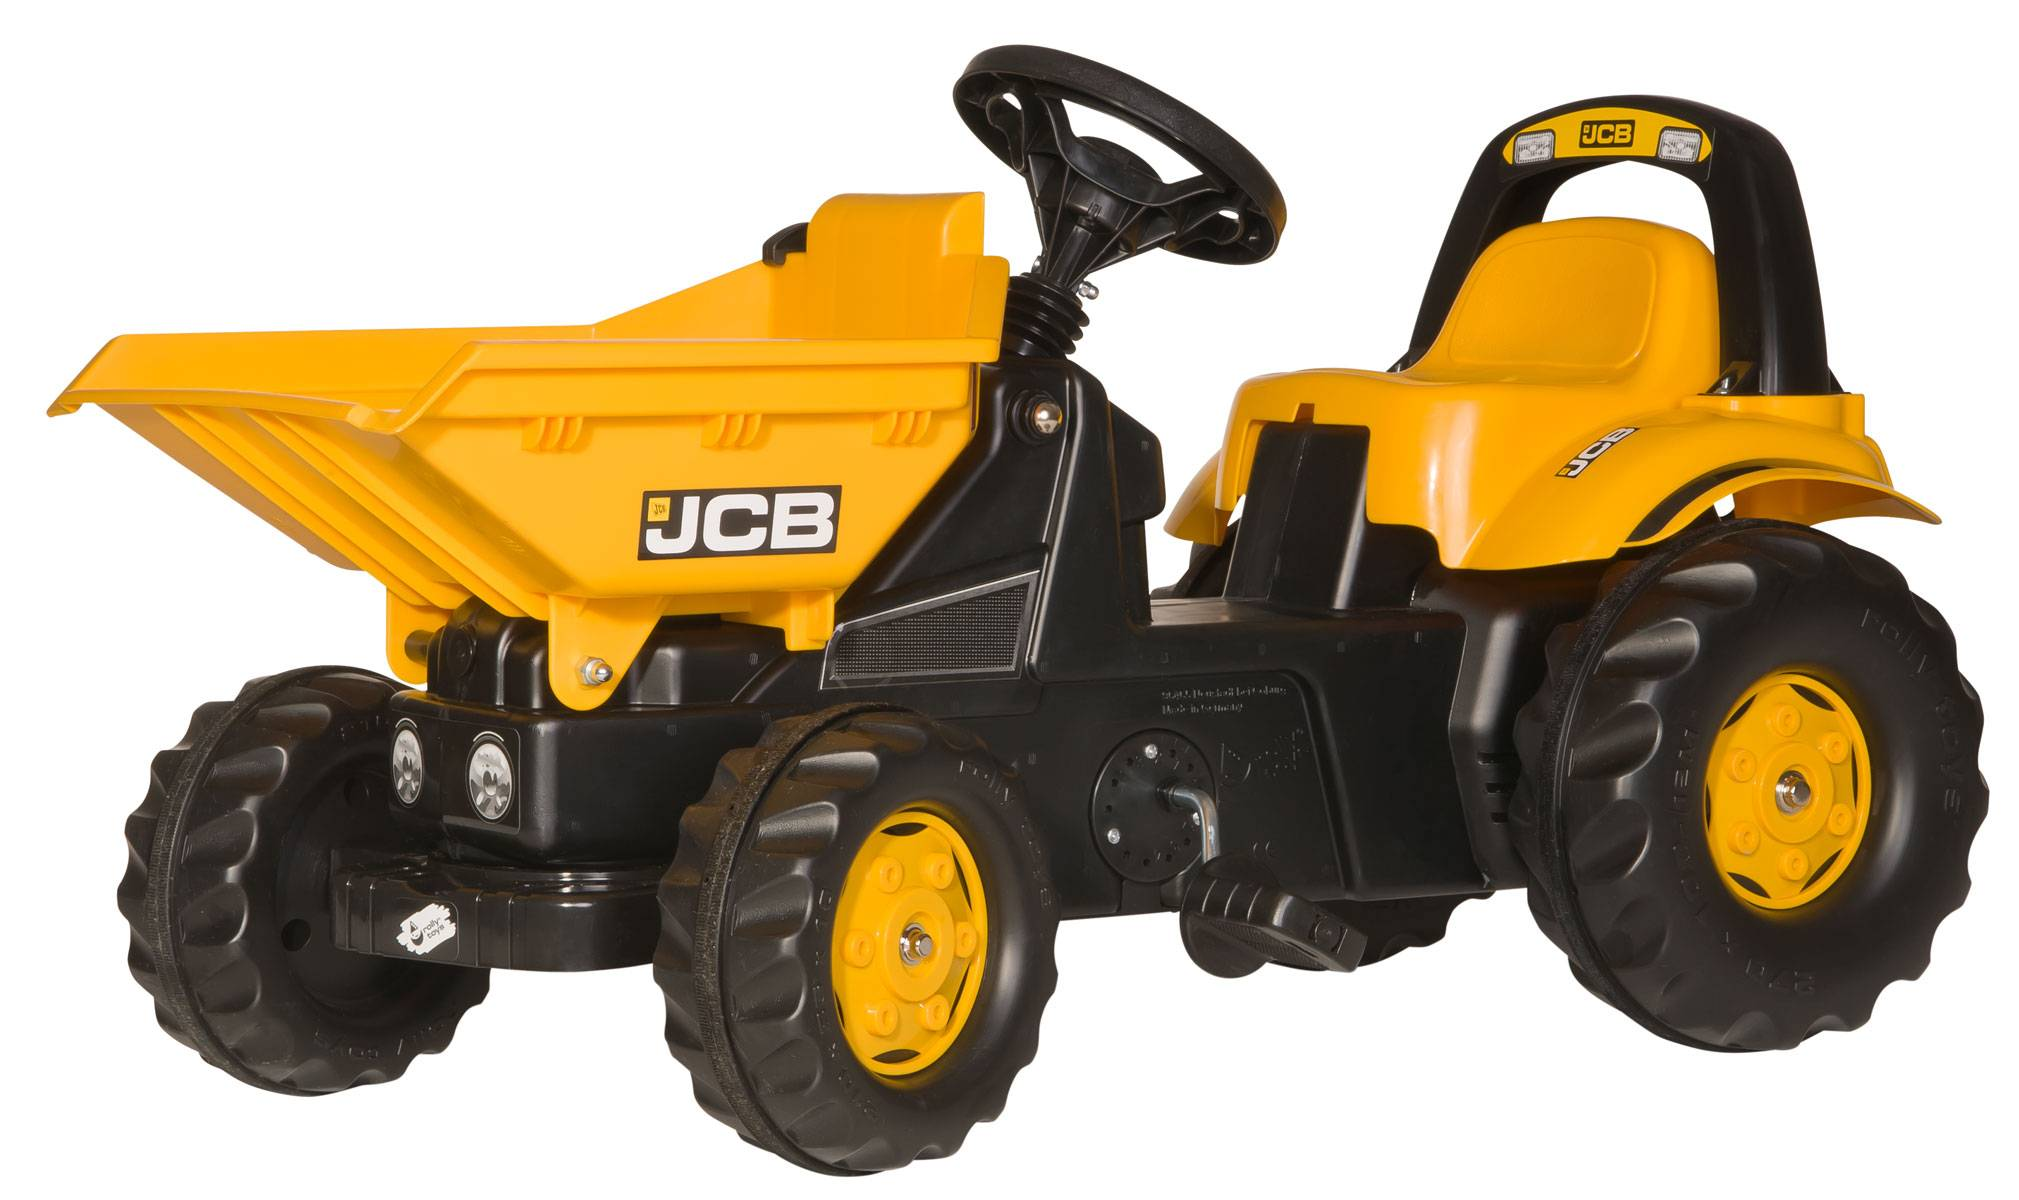 Rolly Toys JCB Dumper Pedal ride-on (024247)